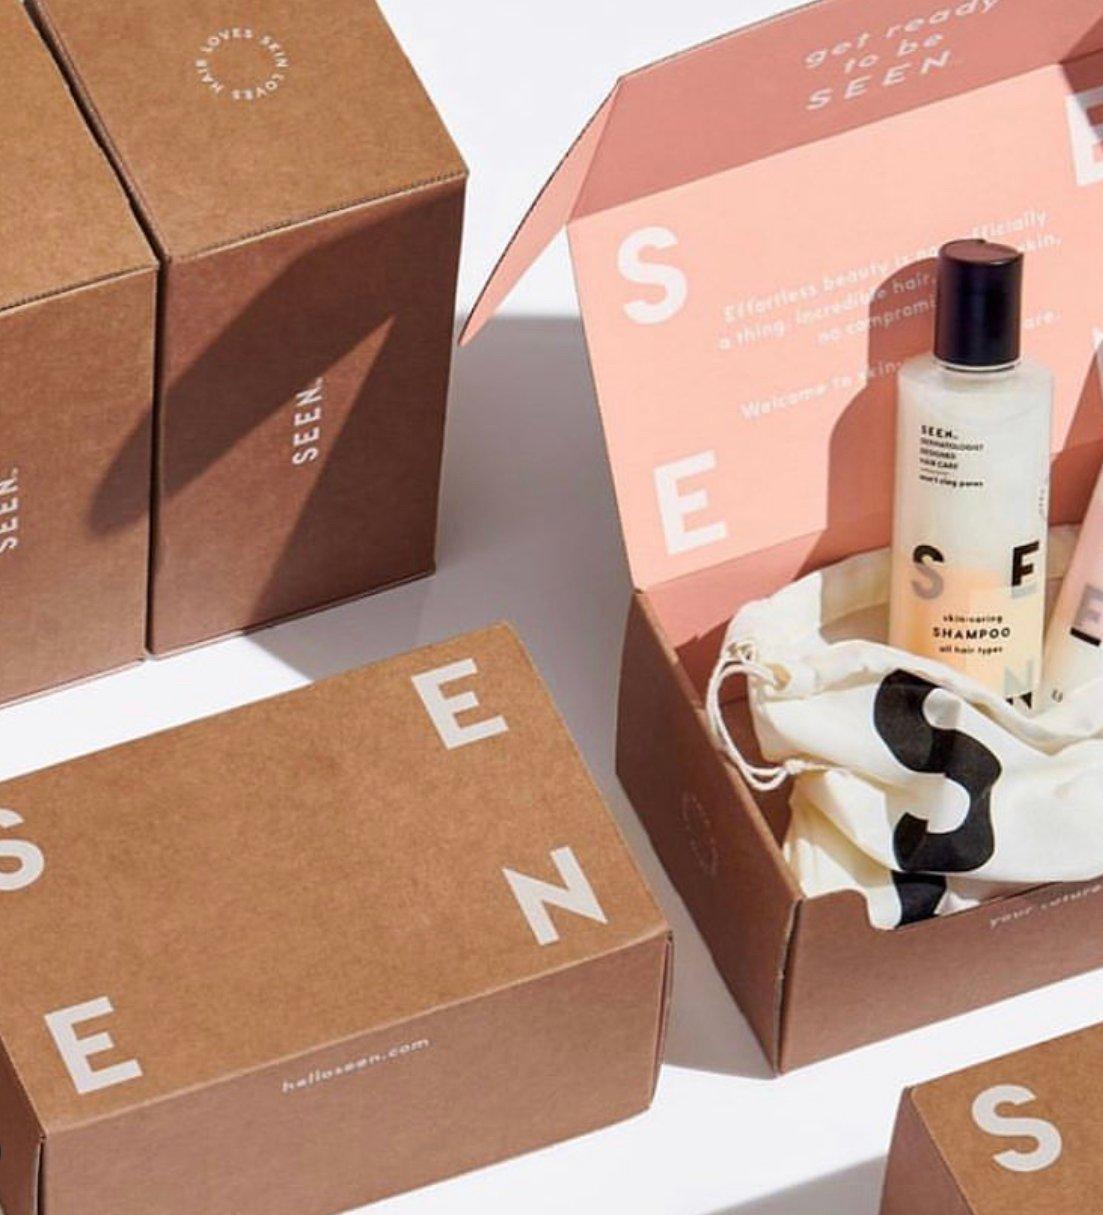 10 Inspiring Subscription Box Packaging Designs that Pop